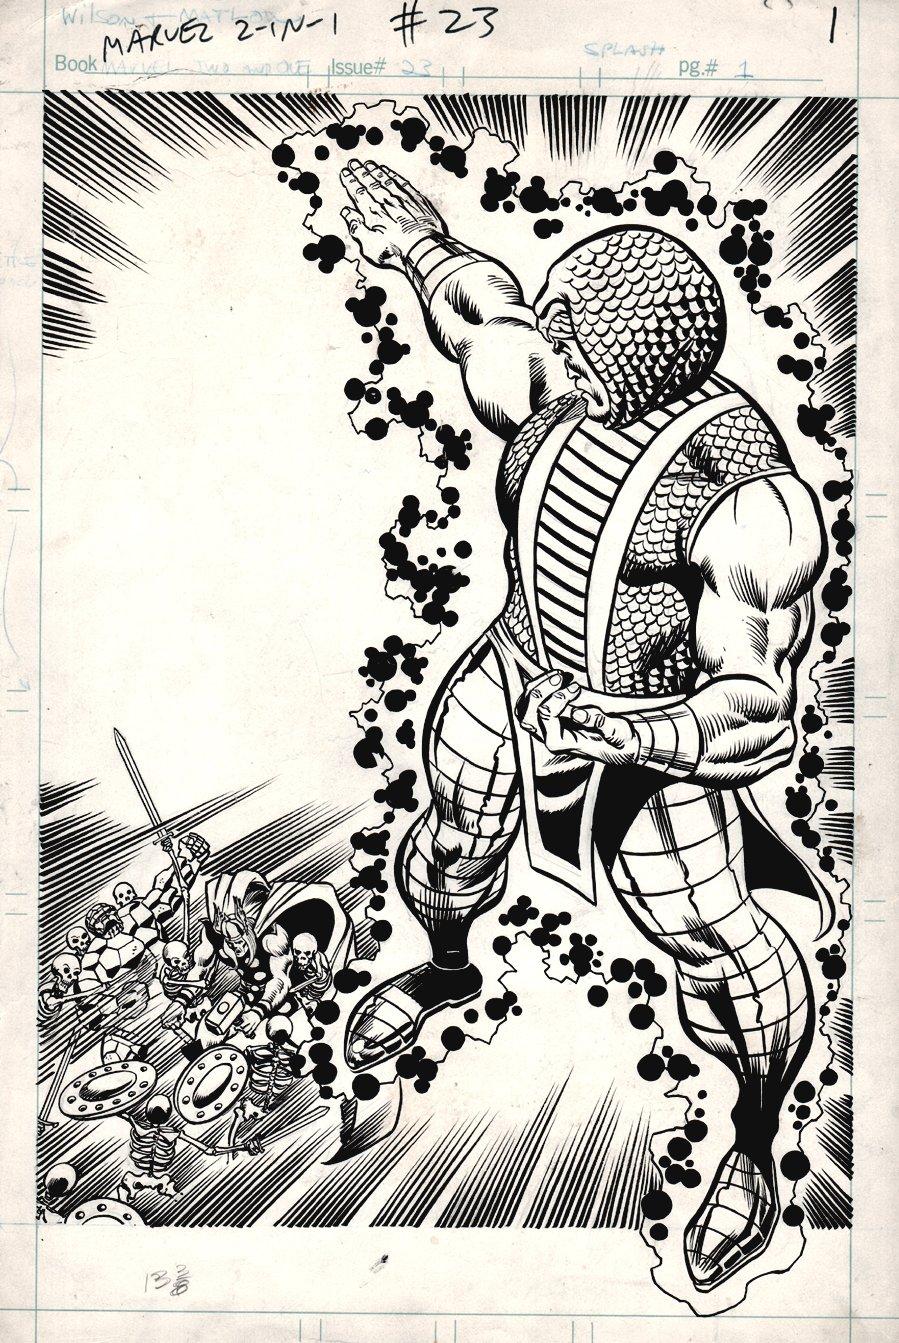 Marvel Two-in-One #23 p 1 SPLASH (1976)